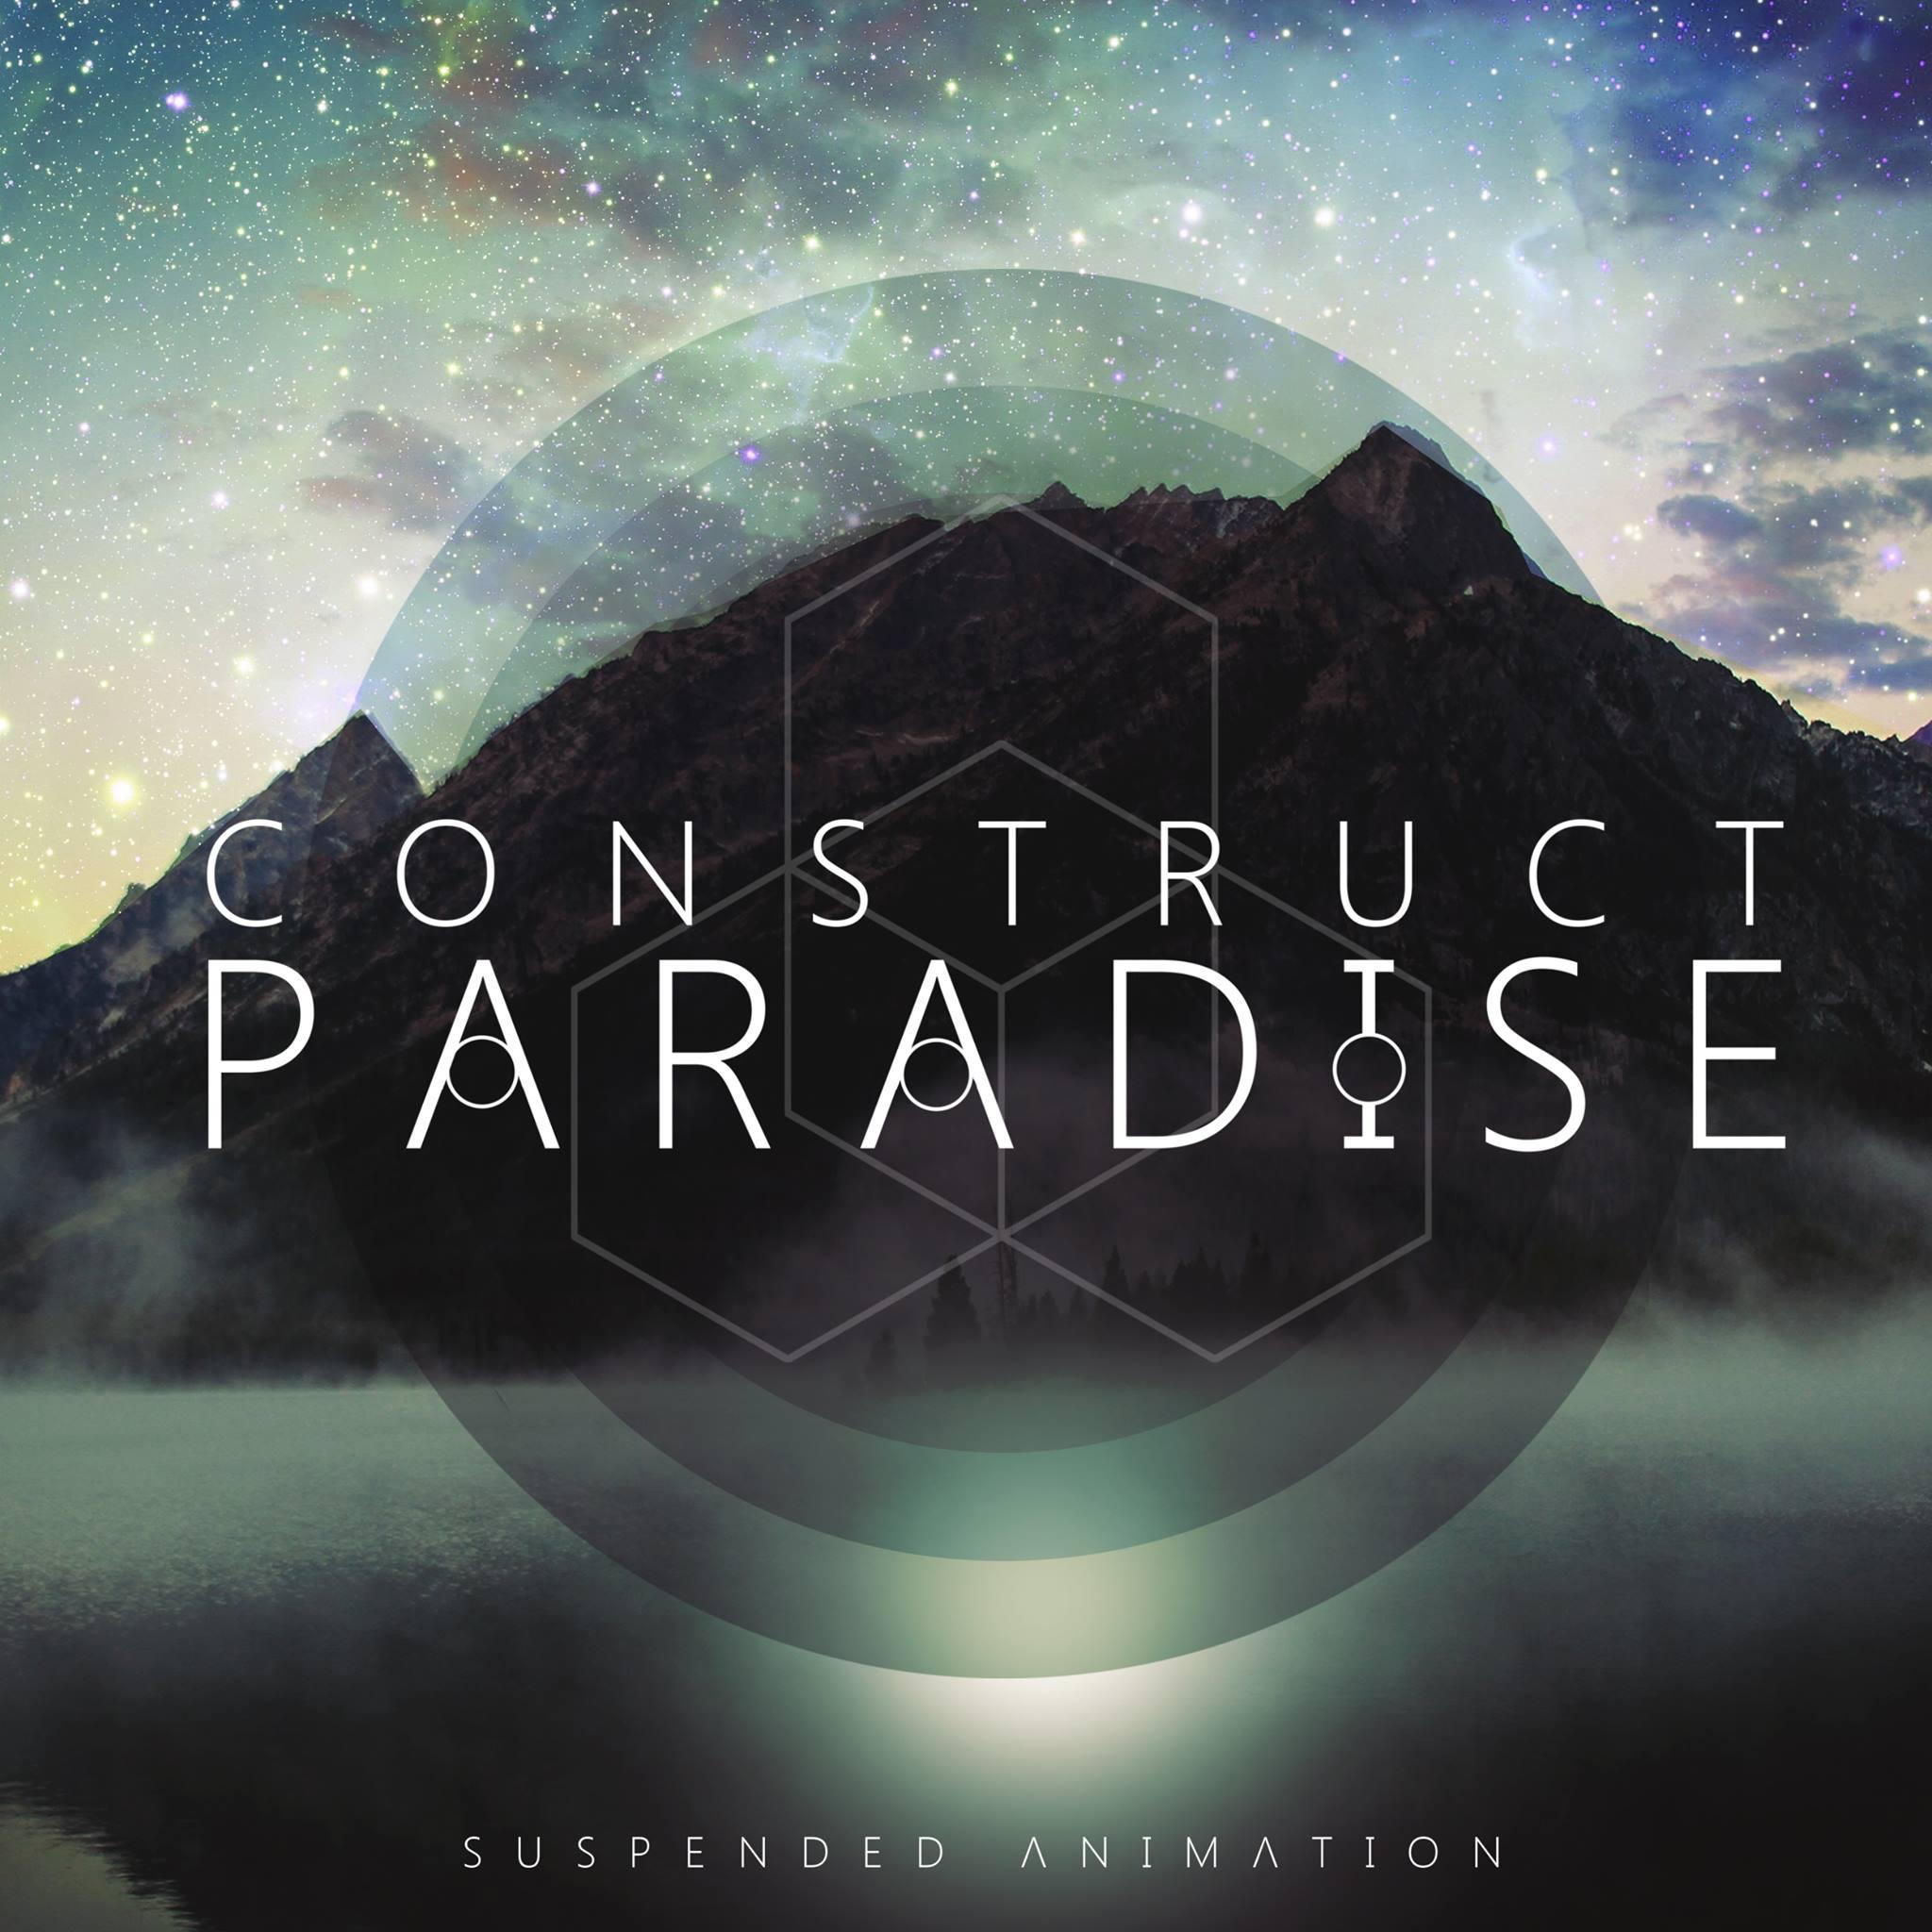 Construct Paradise - Haunt Me [single] (2015)